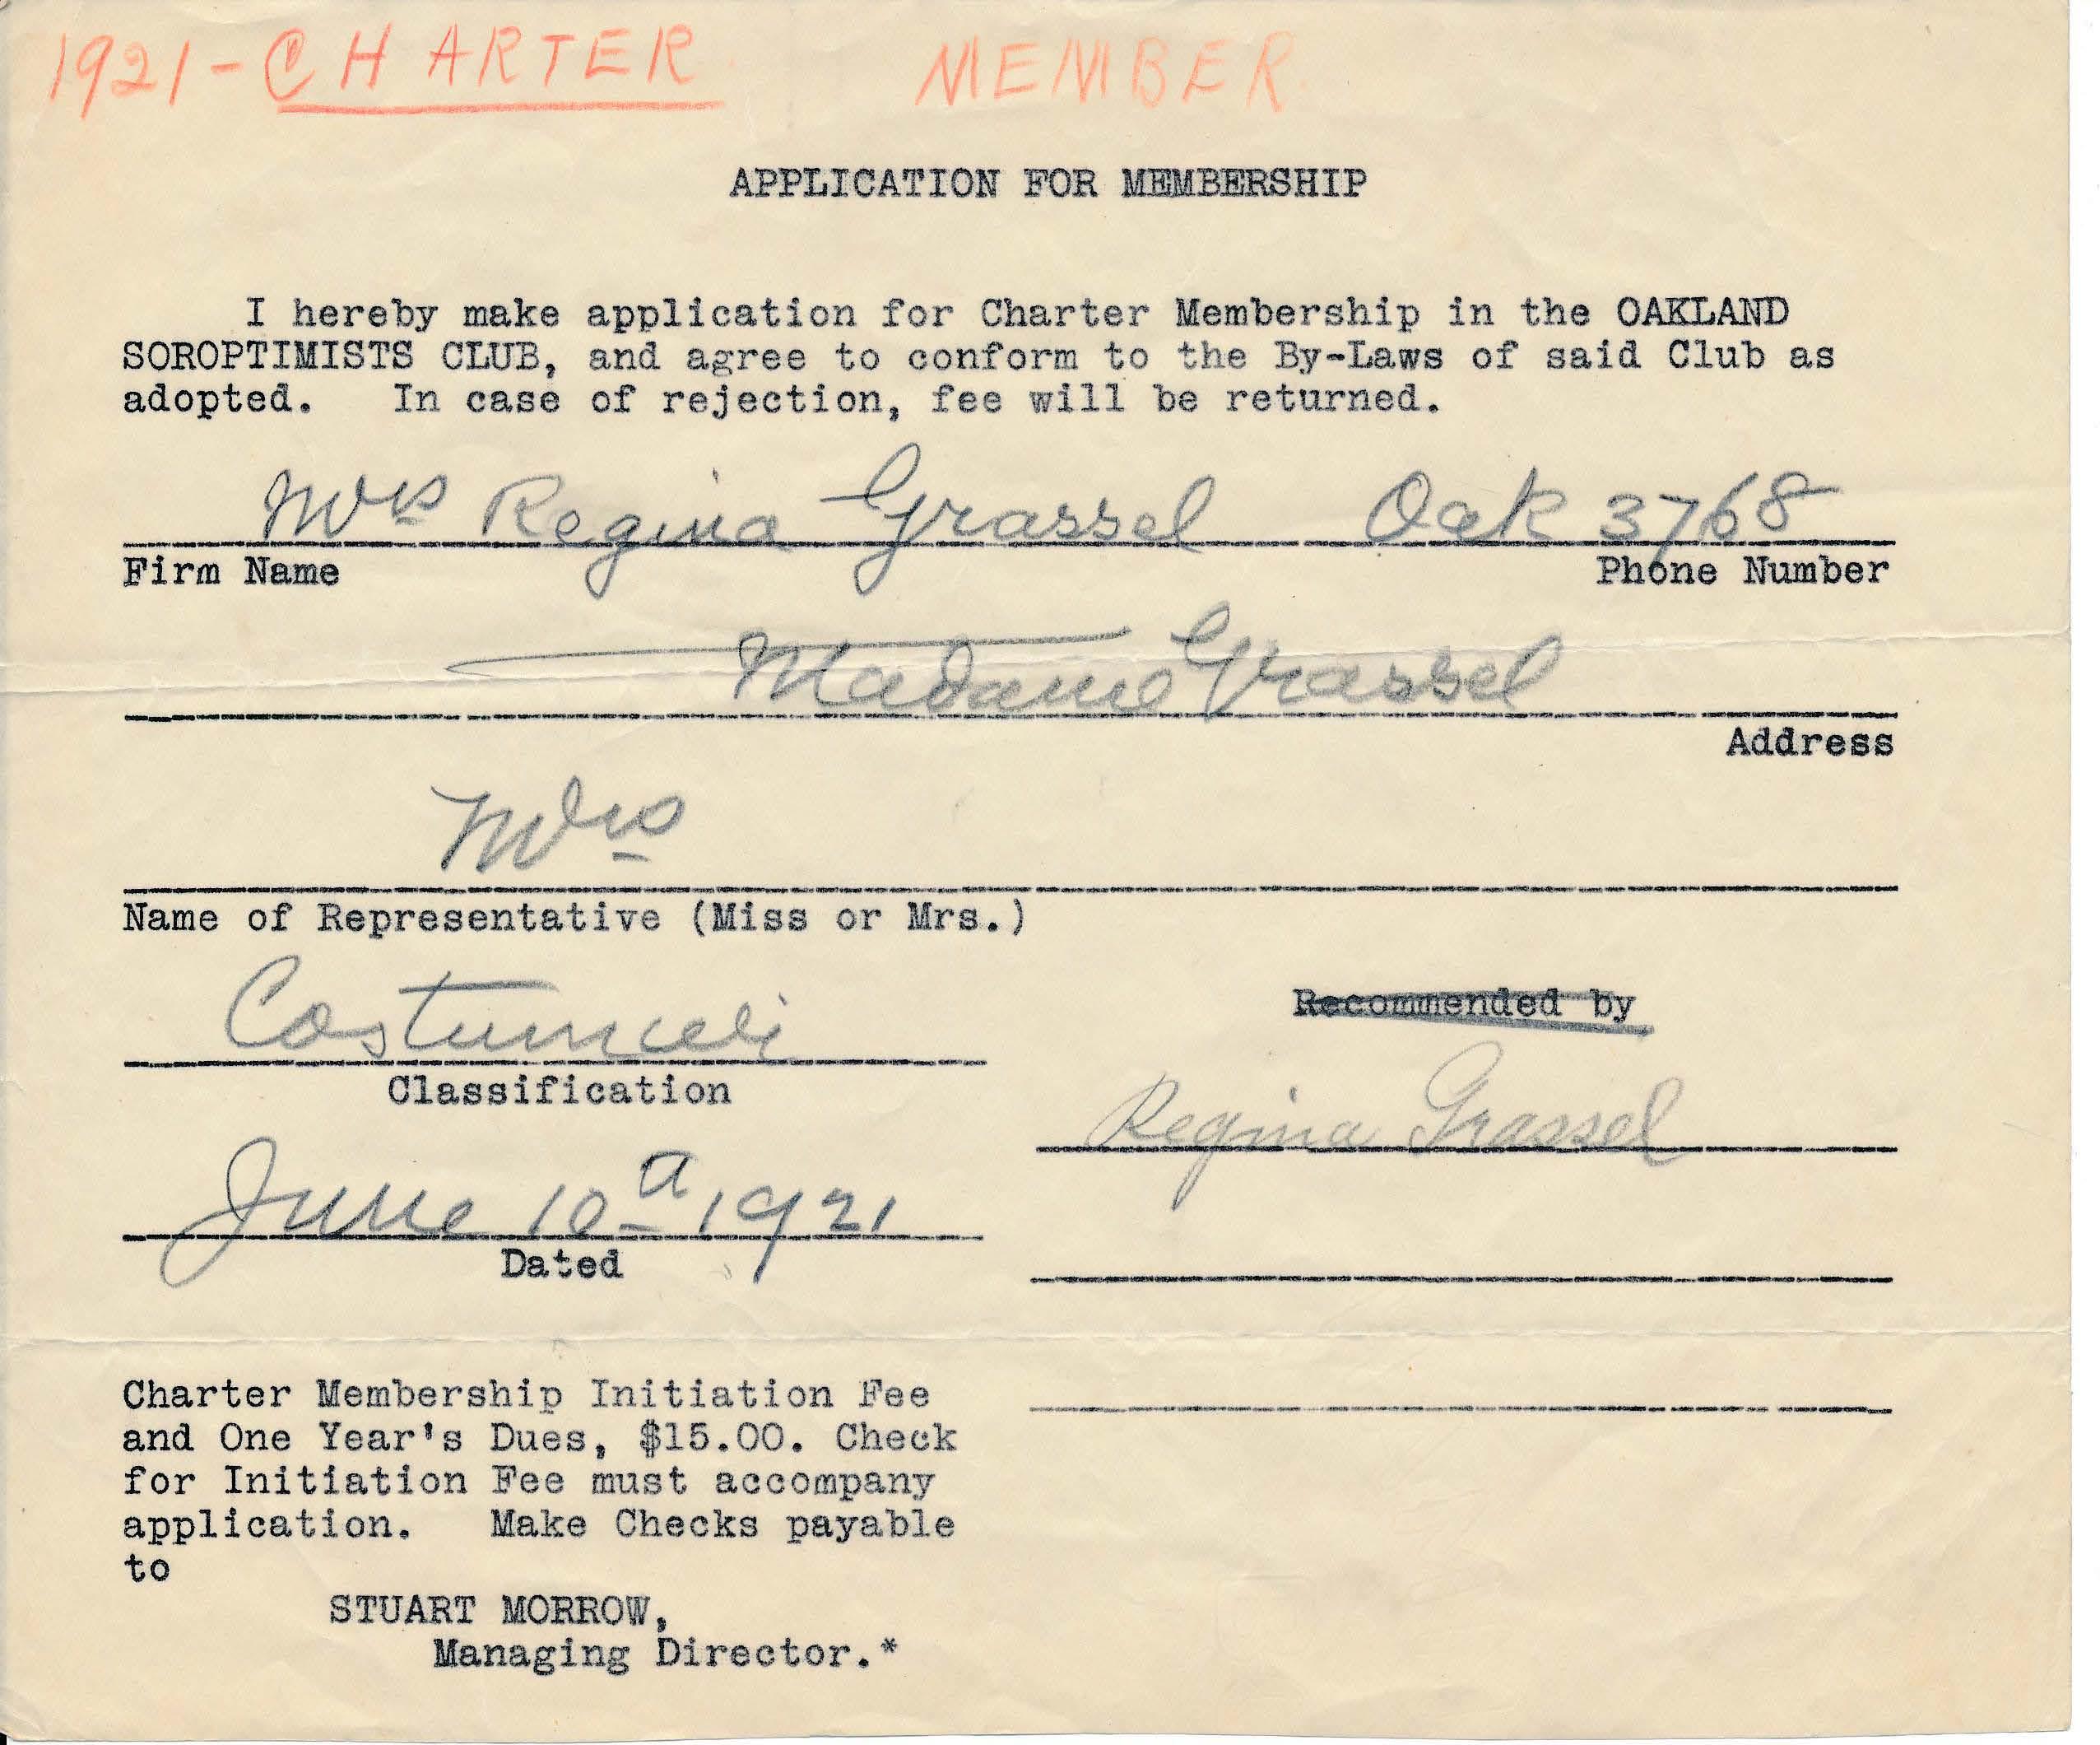 #ThisDayInSIA July 11, 1921 Regina Grassel applicaiton